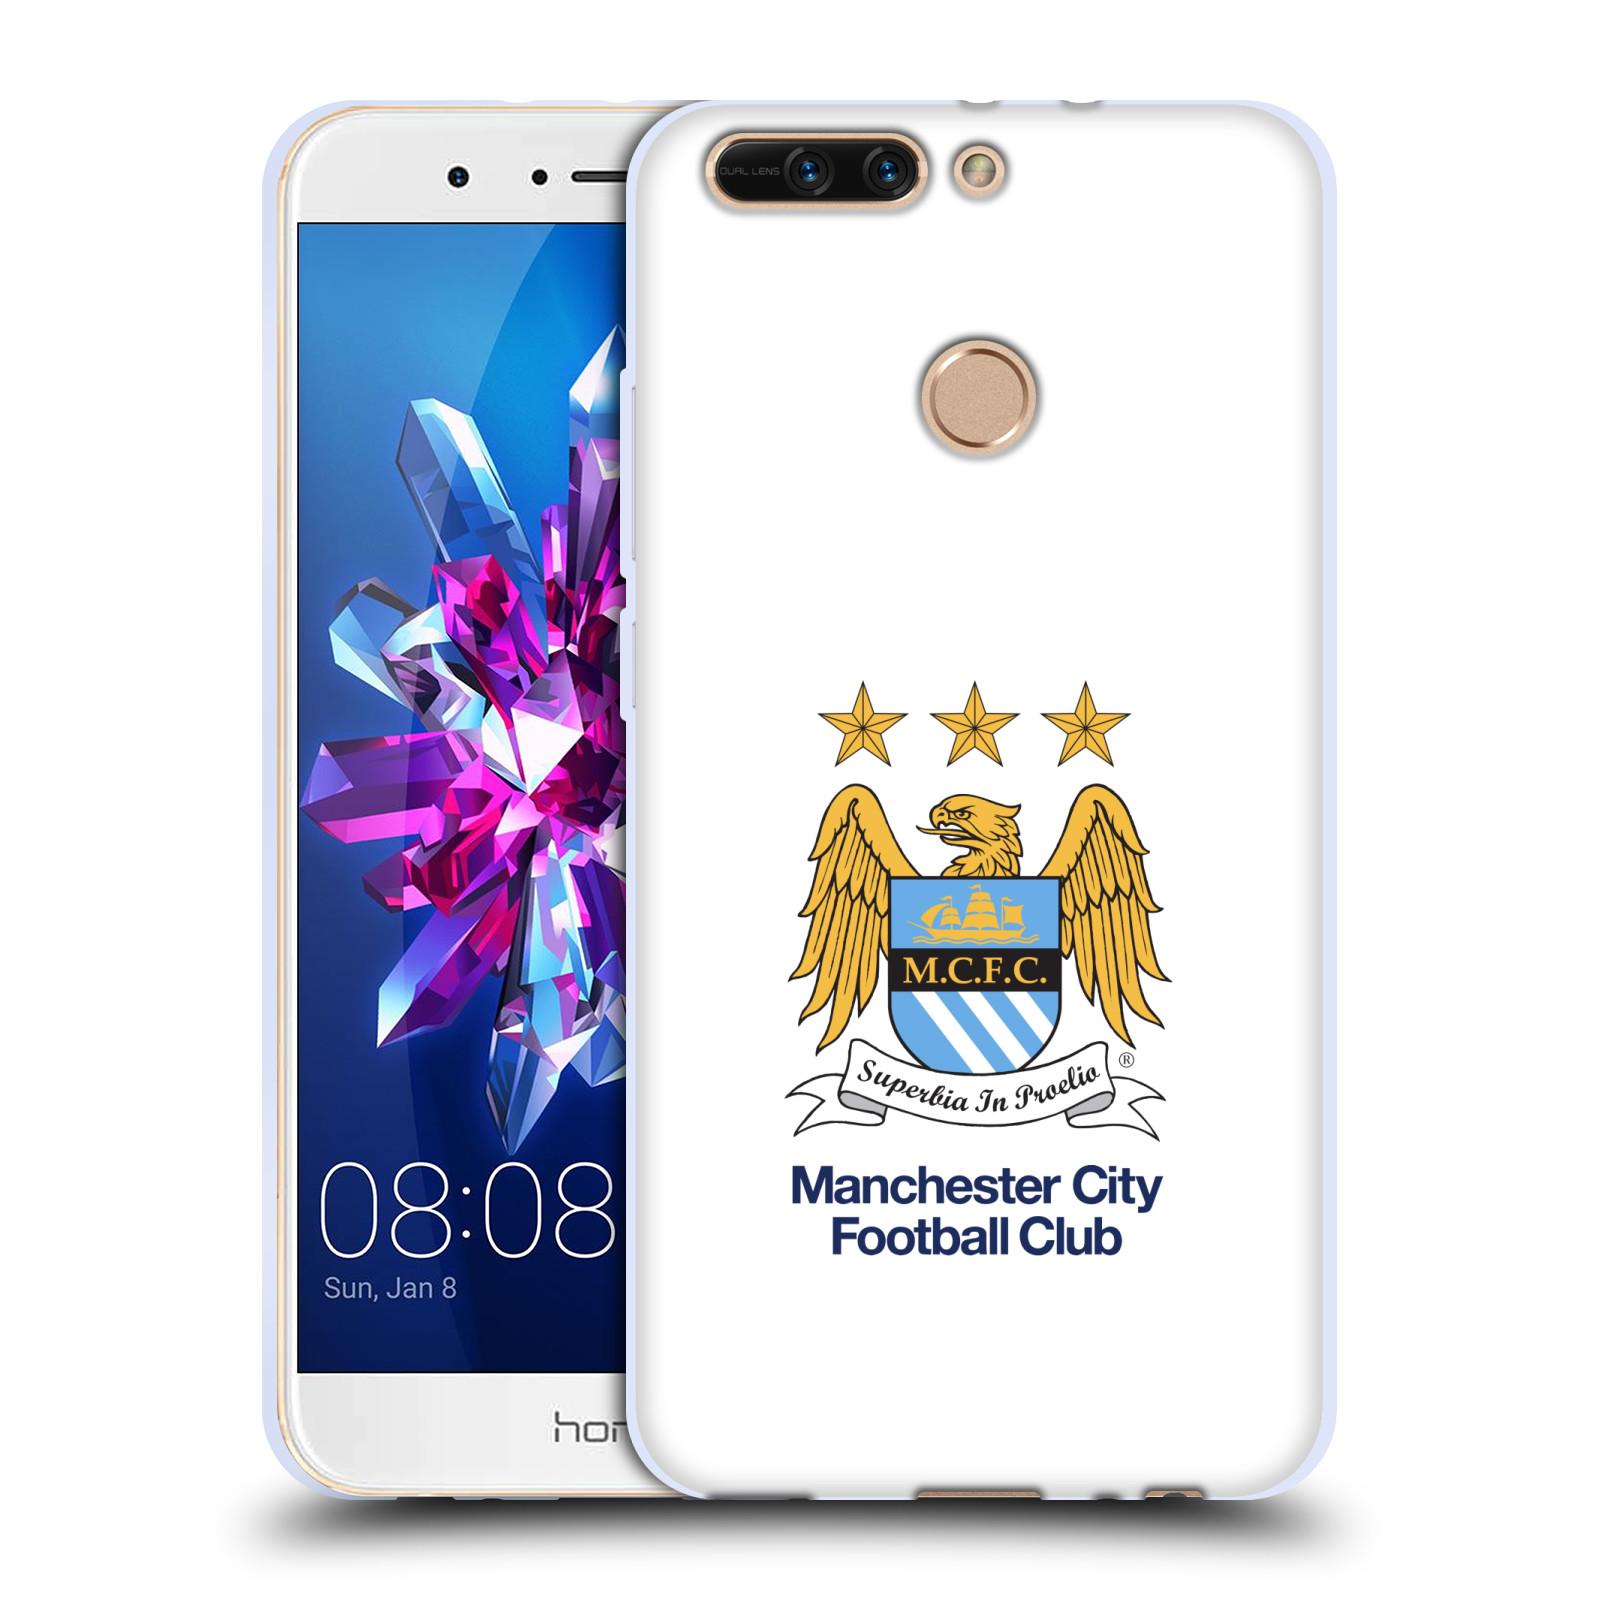 HEAD CASE silikonový obal na mobil Huawei HONOR 8 PRO / Honor 8 PRO DUAL SIM Fotbalový klub Manchester City bílé pozadí velký znak pták